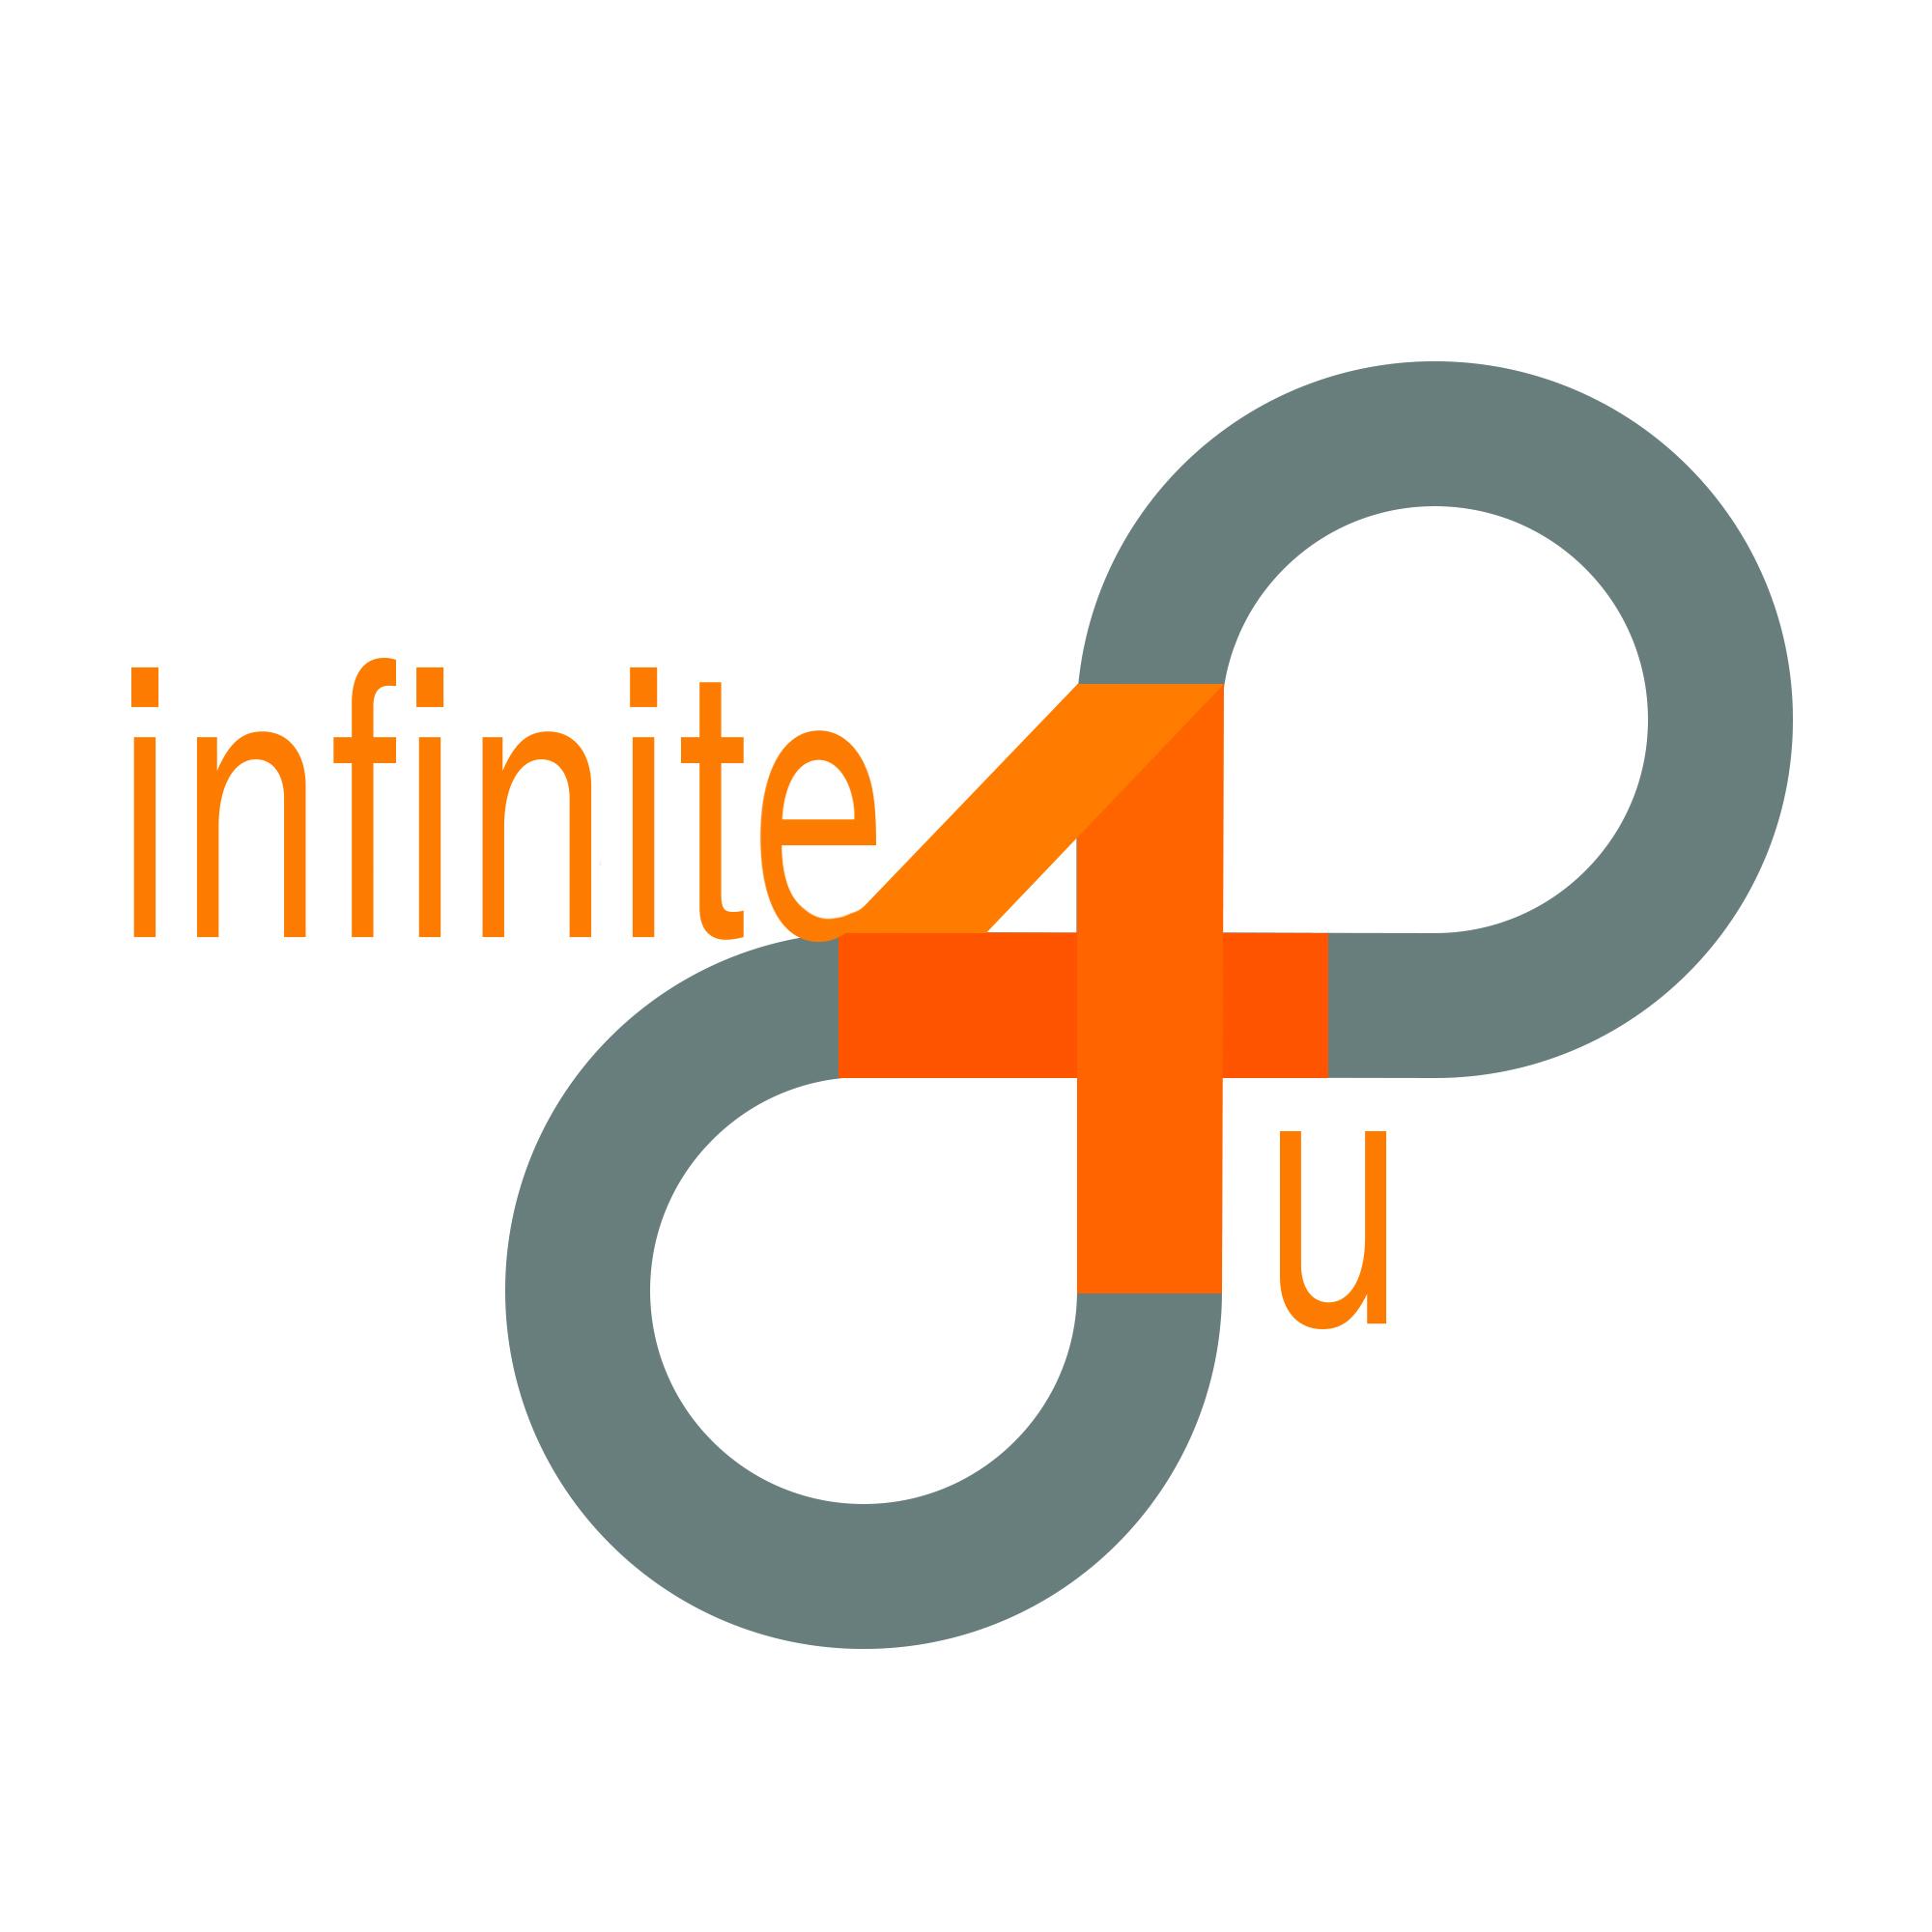 INFINITE4U